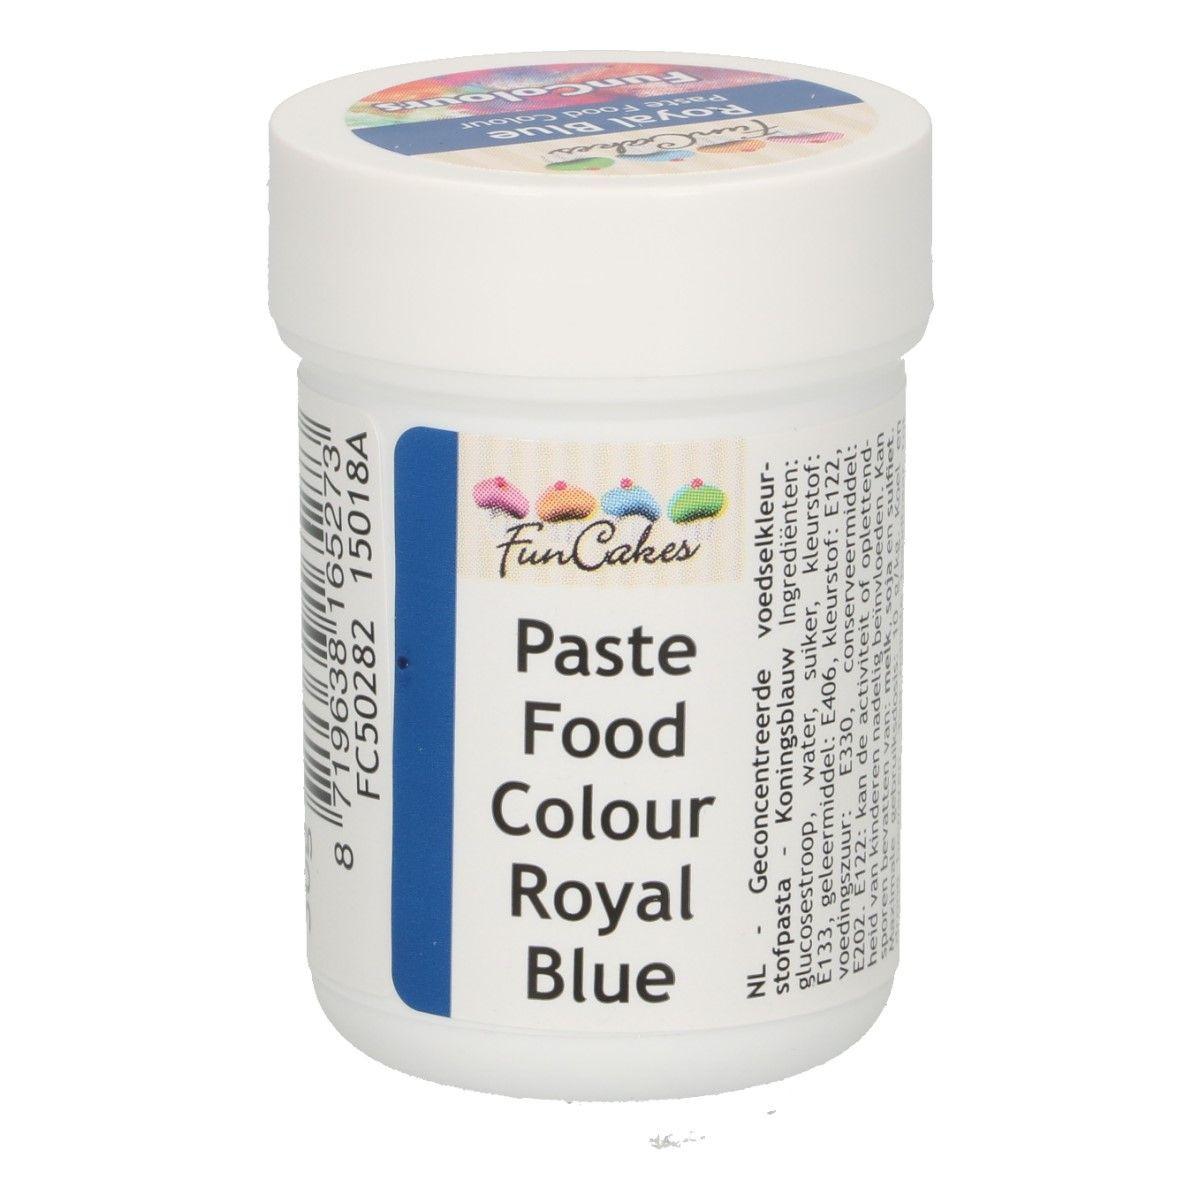 Funcakes FunColours Paste Food Colour - Royal Blue/Königsblau 30 g